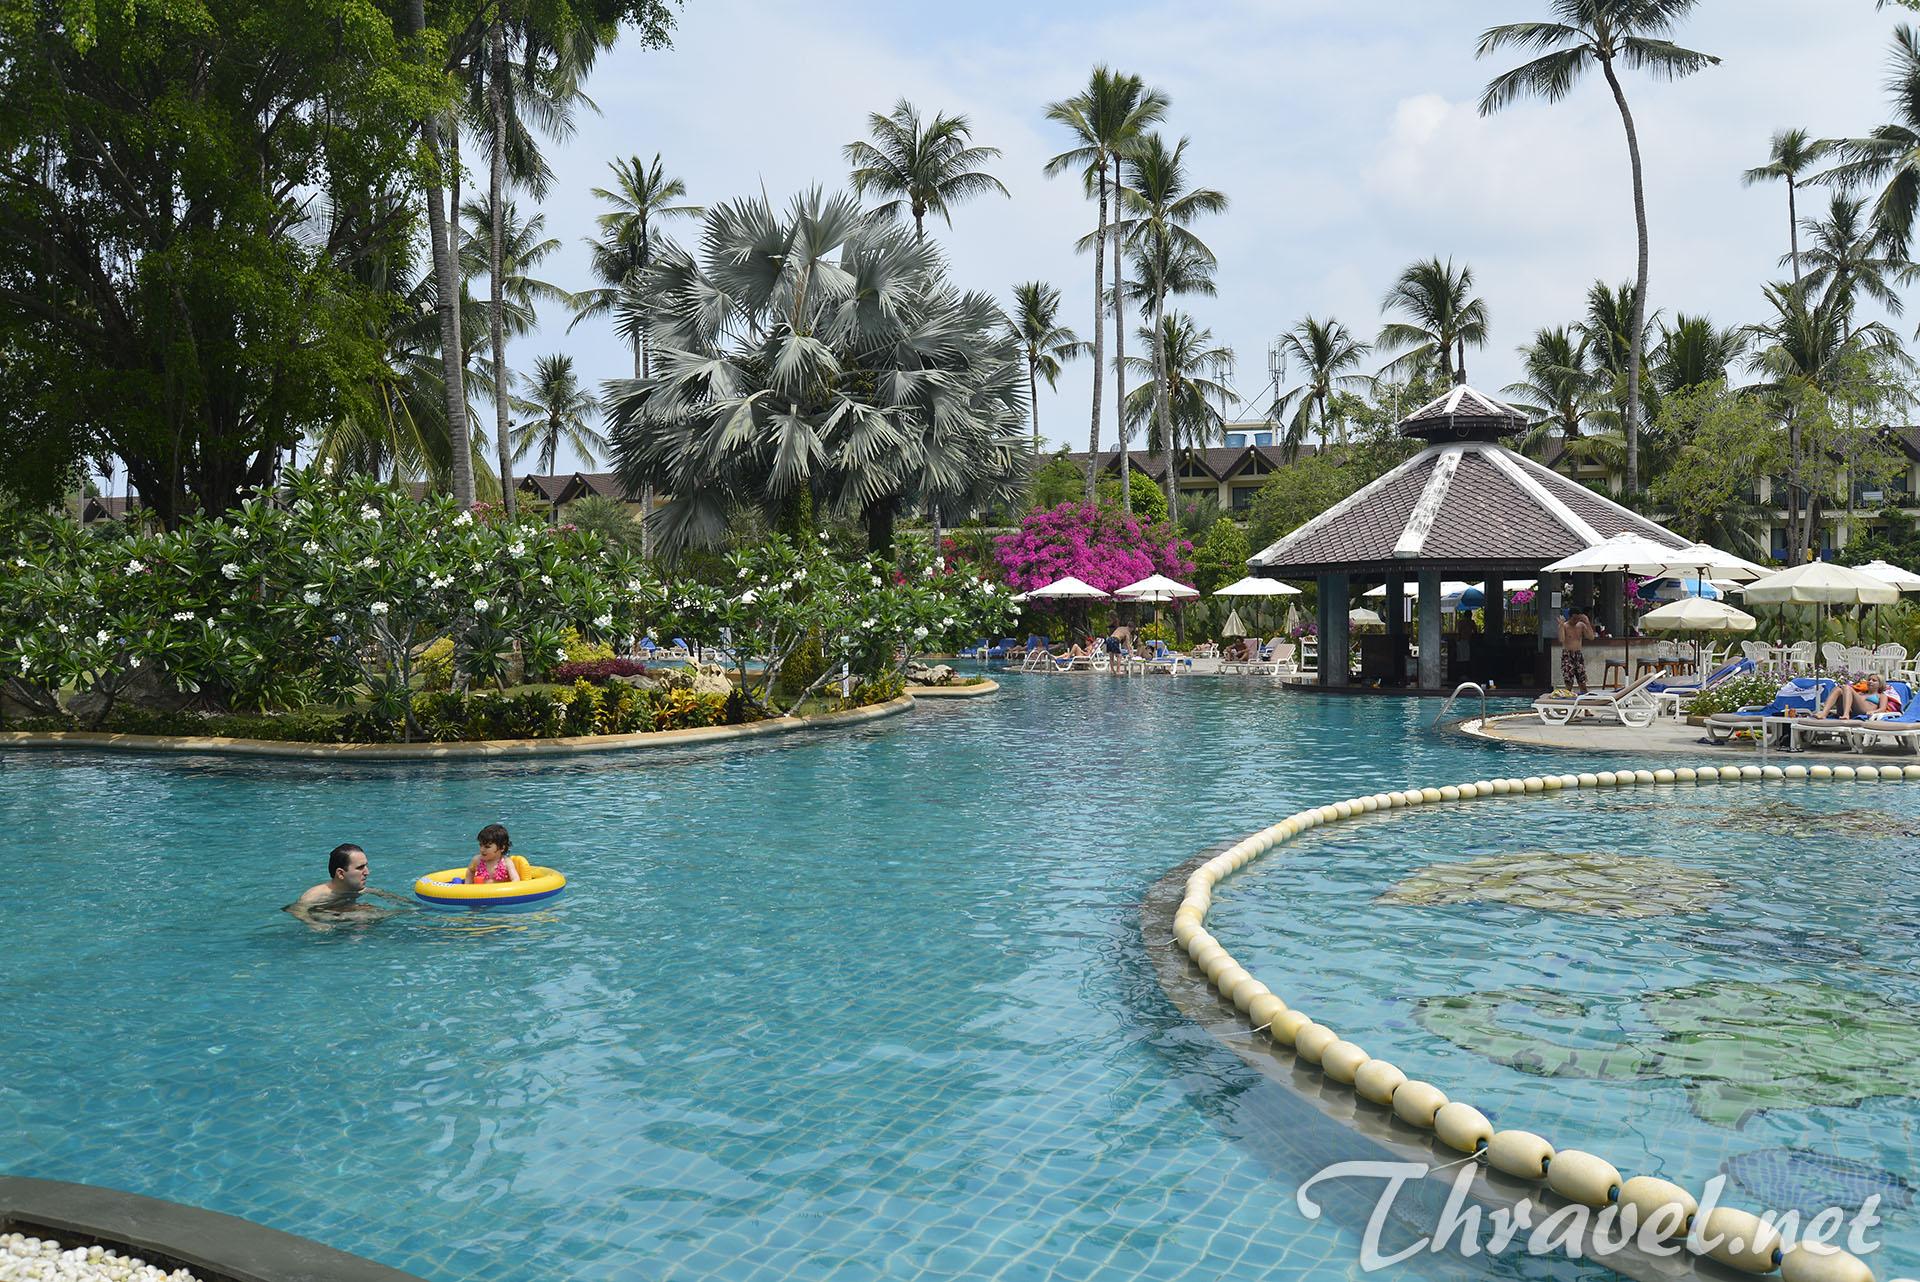 duangjitt-resort-and-spa-hotel-patong-beach-phuket-thailand-01